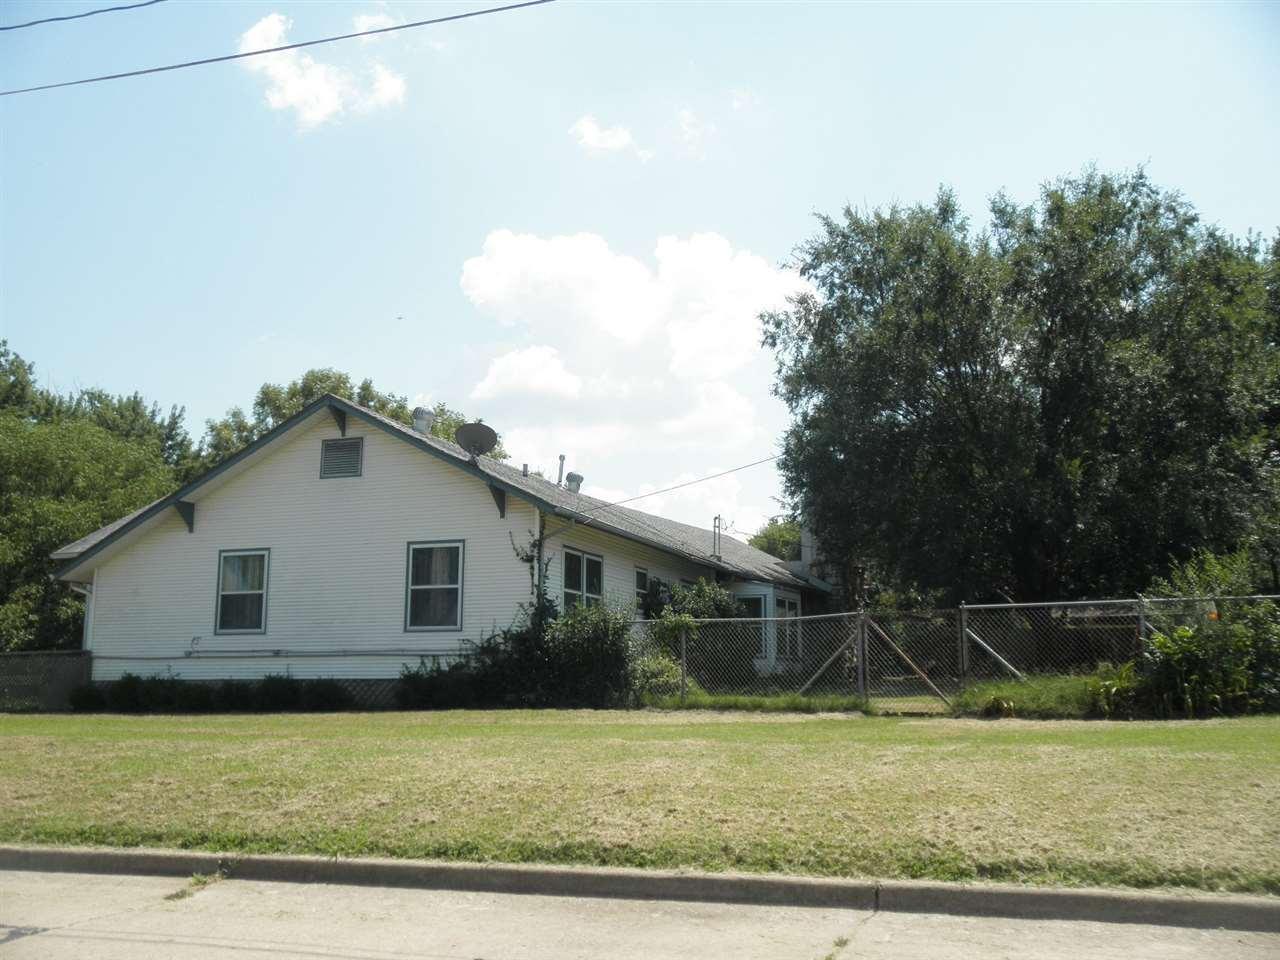 #century21groupone,#homesforsaleponcacity,#poncacityrealestate | 840 N Birch  Ponca City, OK 74601 5